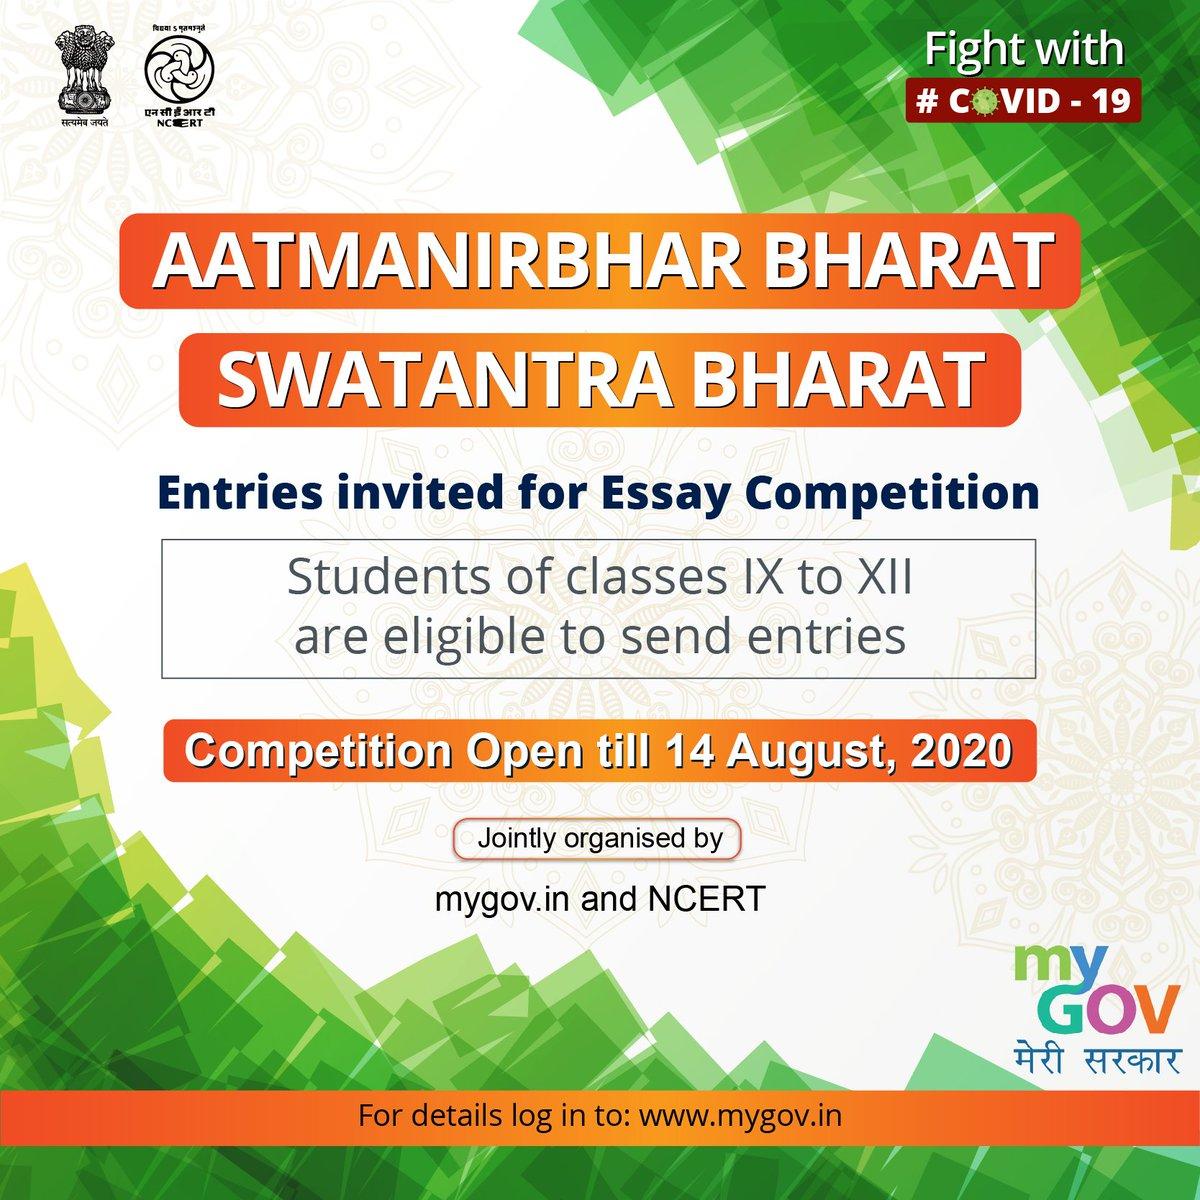 ONLINE ESSAY COMPETITION ON THE THEME AATMANIRBHAR BHARAT-SWATANTRA BHARAT